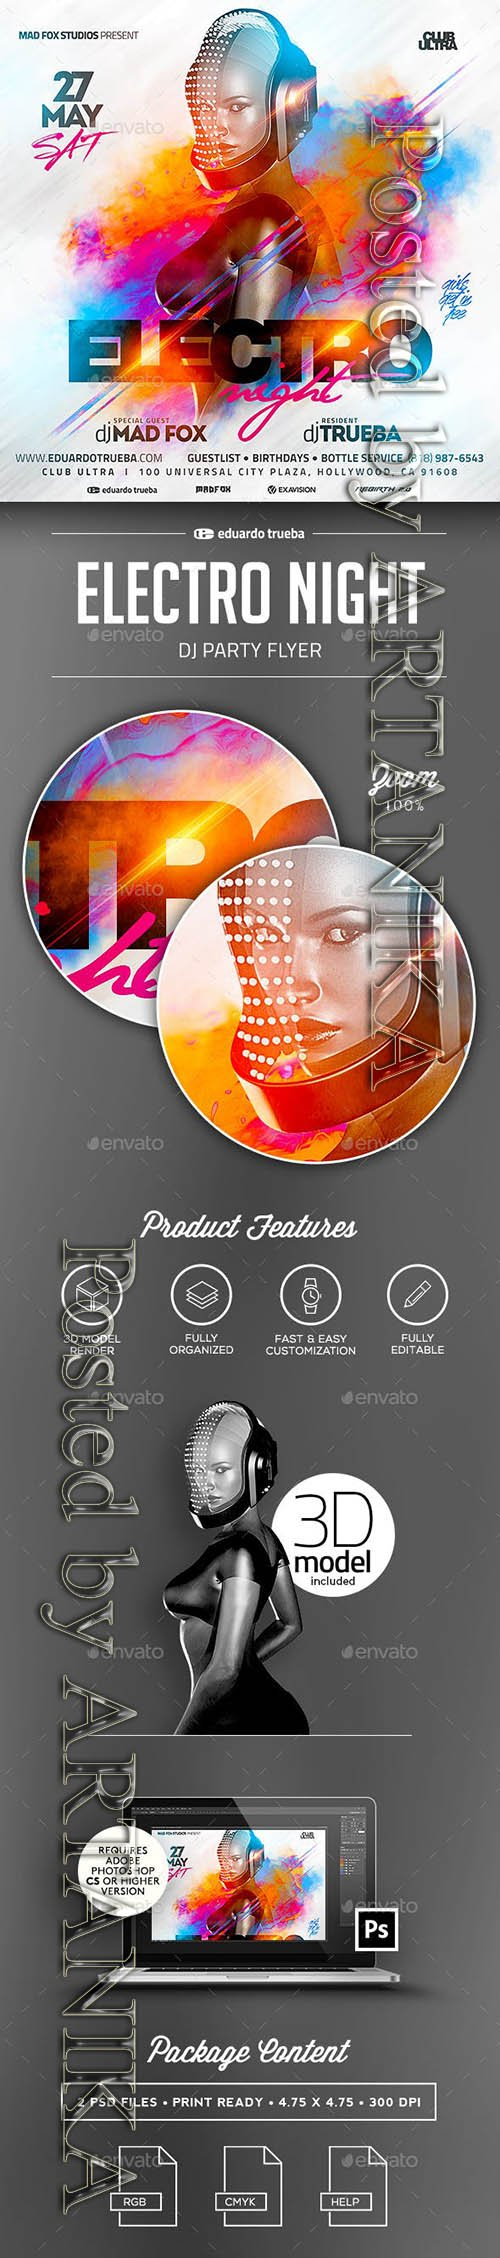 GraphicRiver - Electro Night Dj Party Flyer 23161444